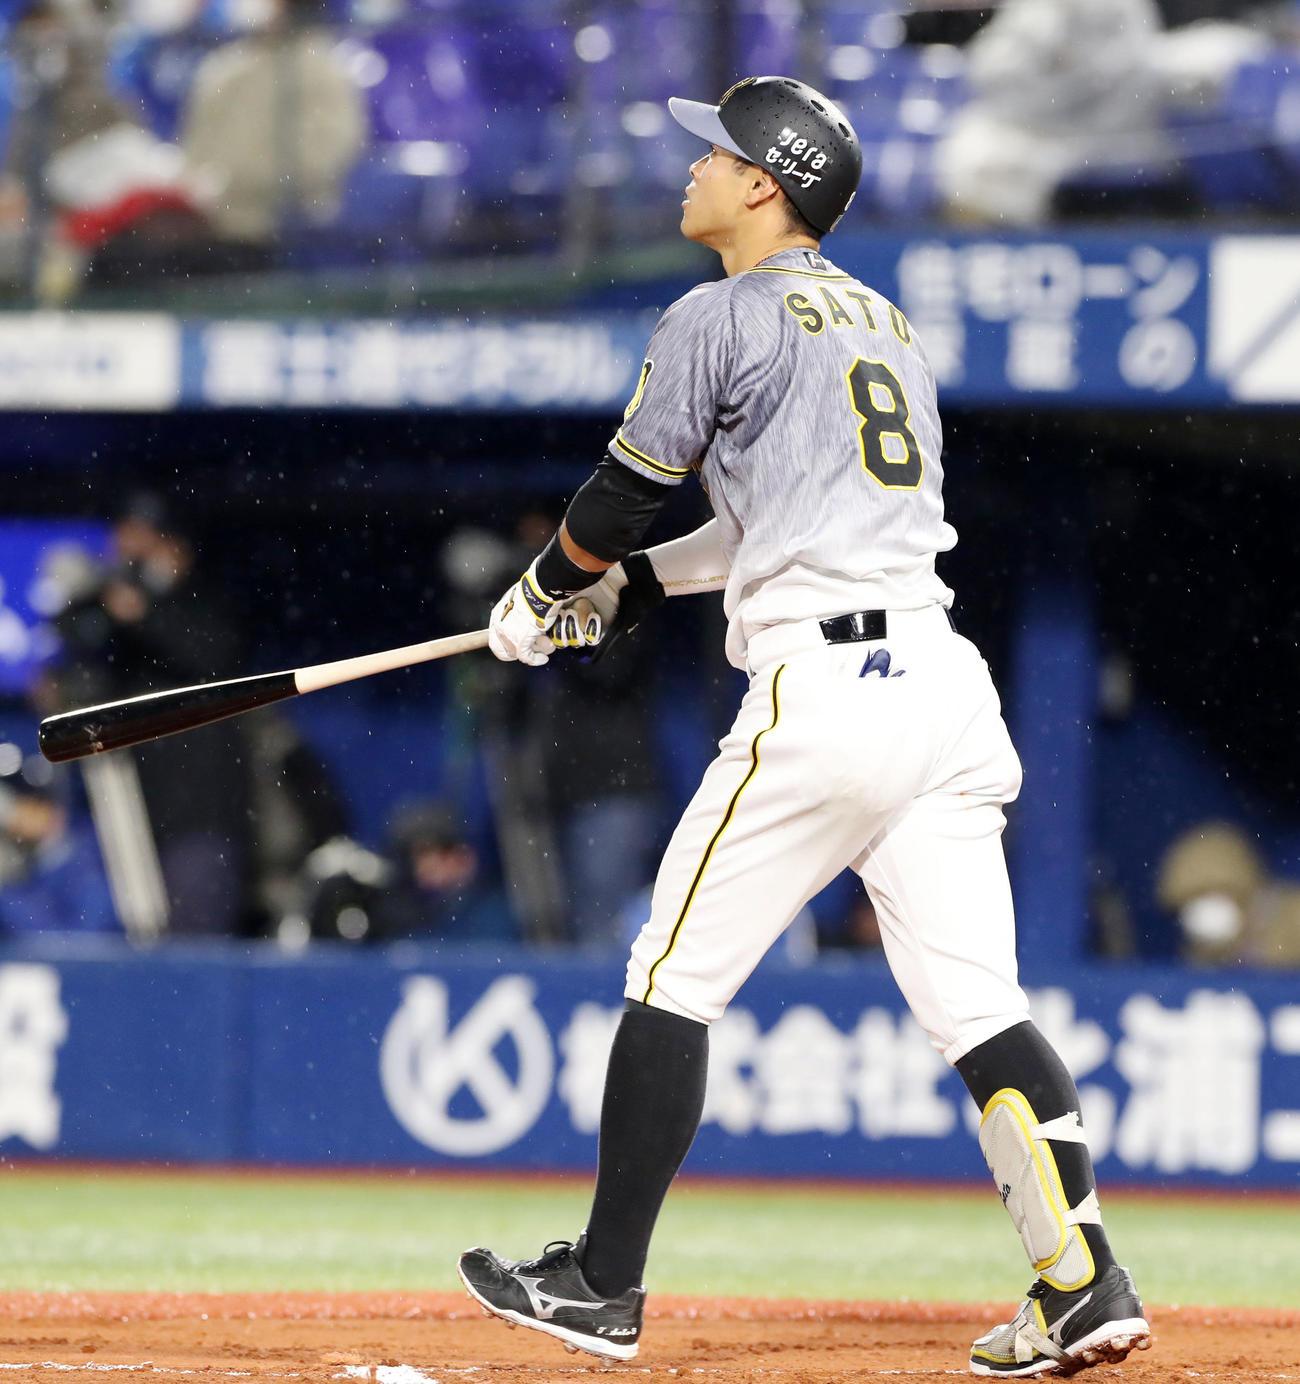 DeNA対阪神 6回表阪神無死、佐藤輝は右中間越え本塁打を放つ(撮影・加藤哉)